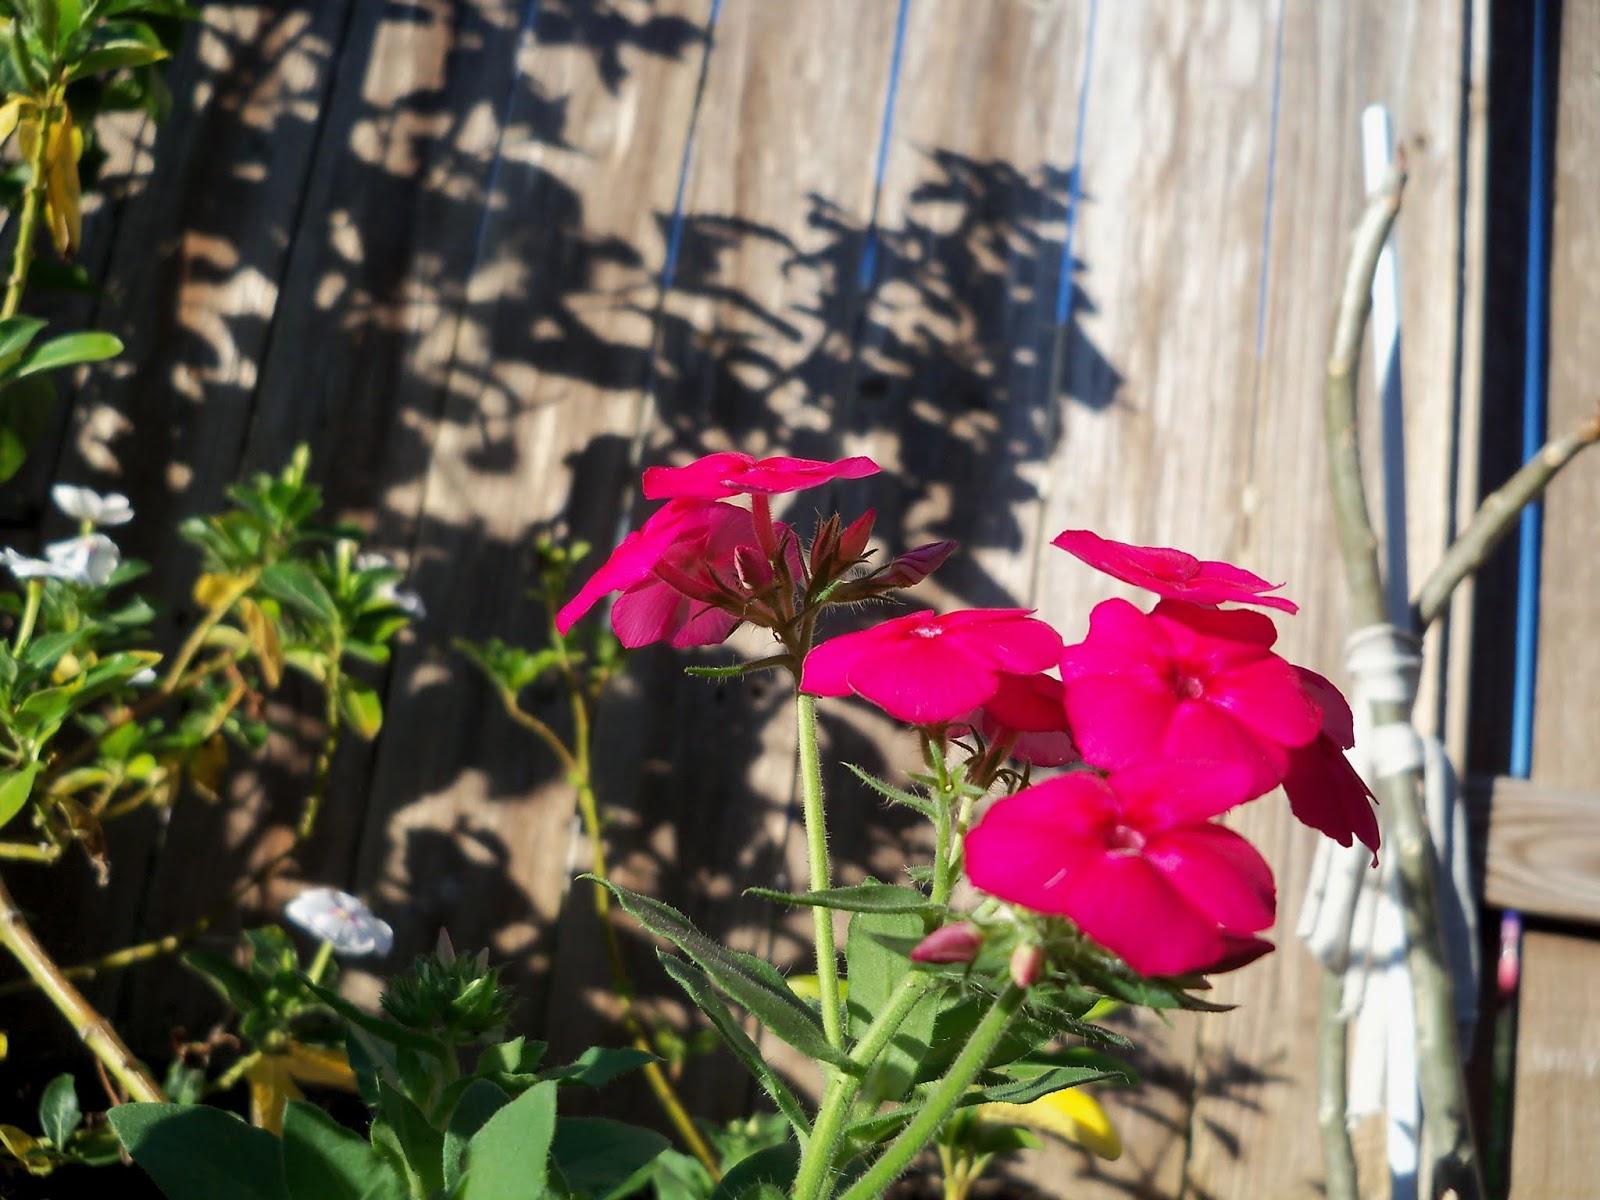 Gardening 2013 - 115_5378.JPG